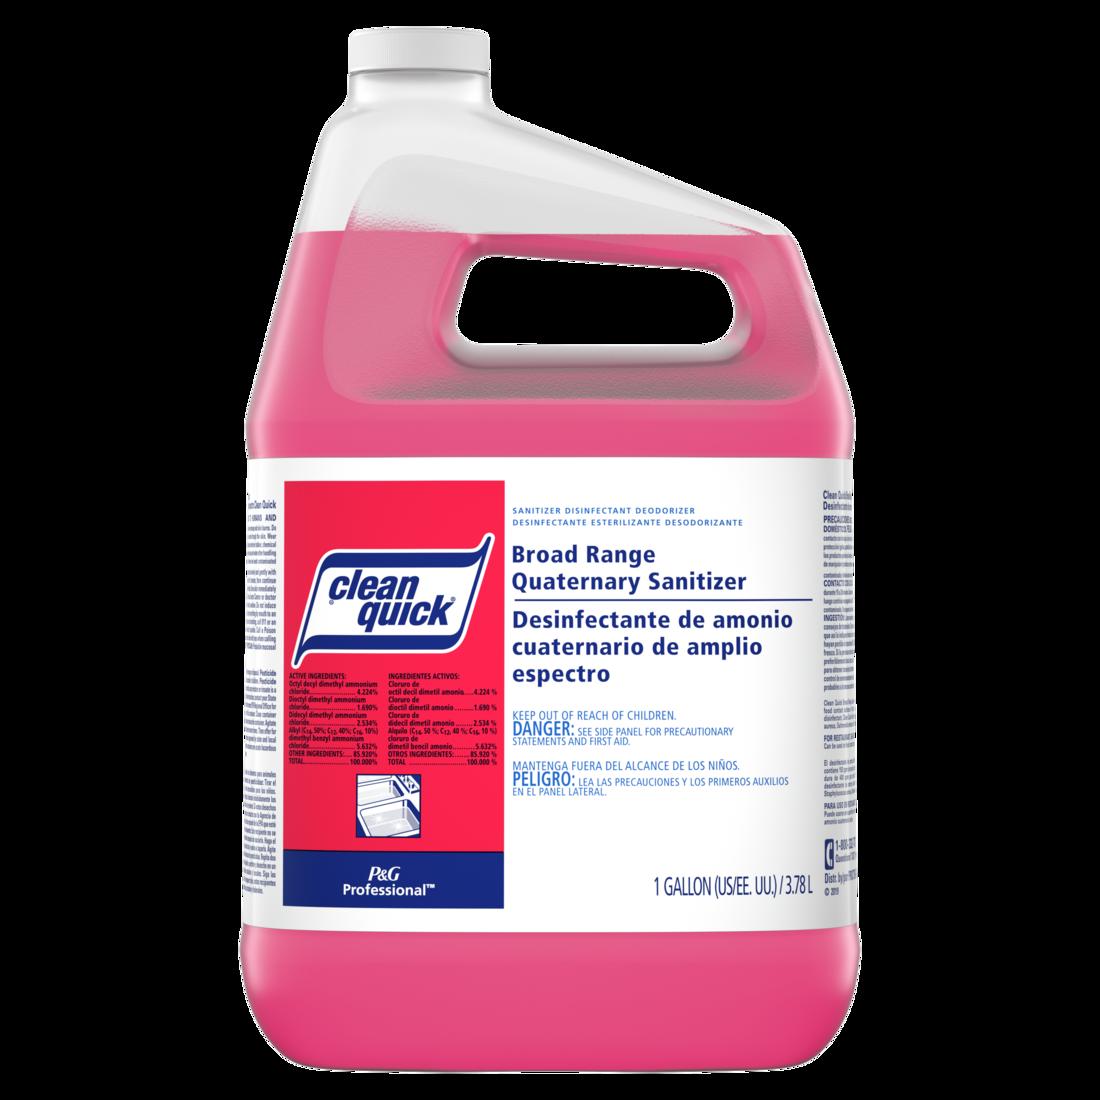 Clean Quick Broad Range Quaternary Sanitizer